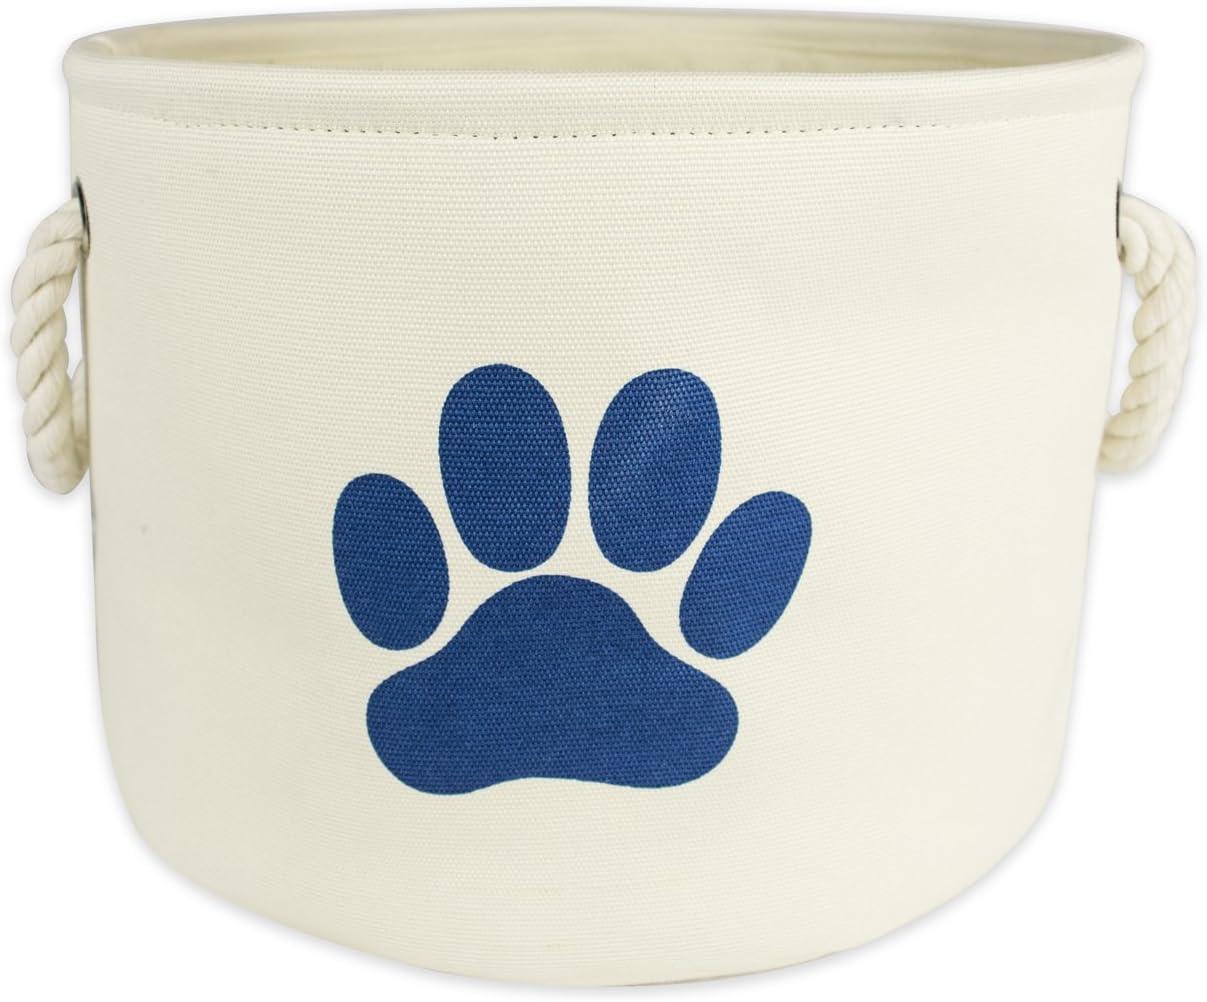 "Bone Dry Paw Print Collapsible Polyester Pet Storage Bin, Round Medium - 15 x 15 x 12"", Paw Print Off-White"